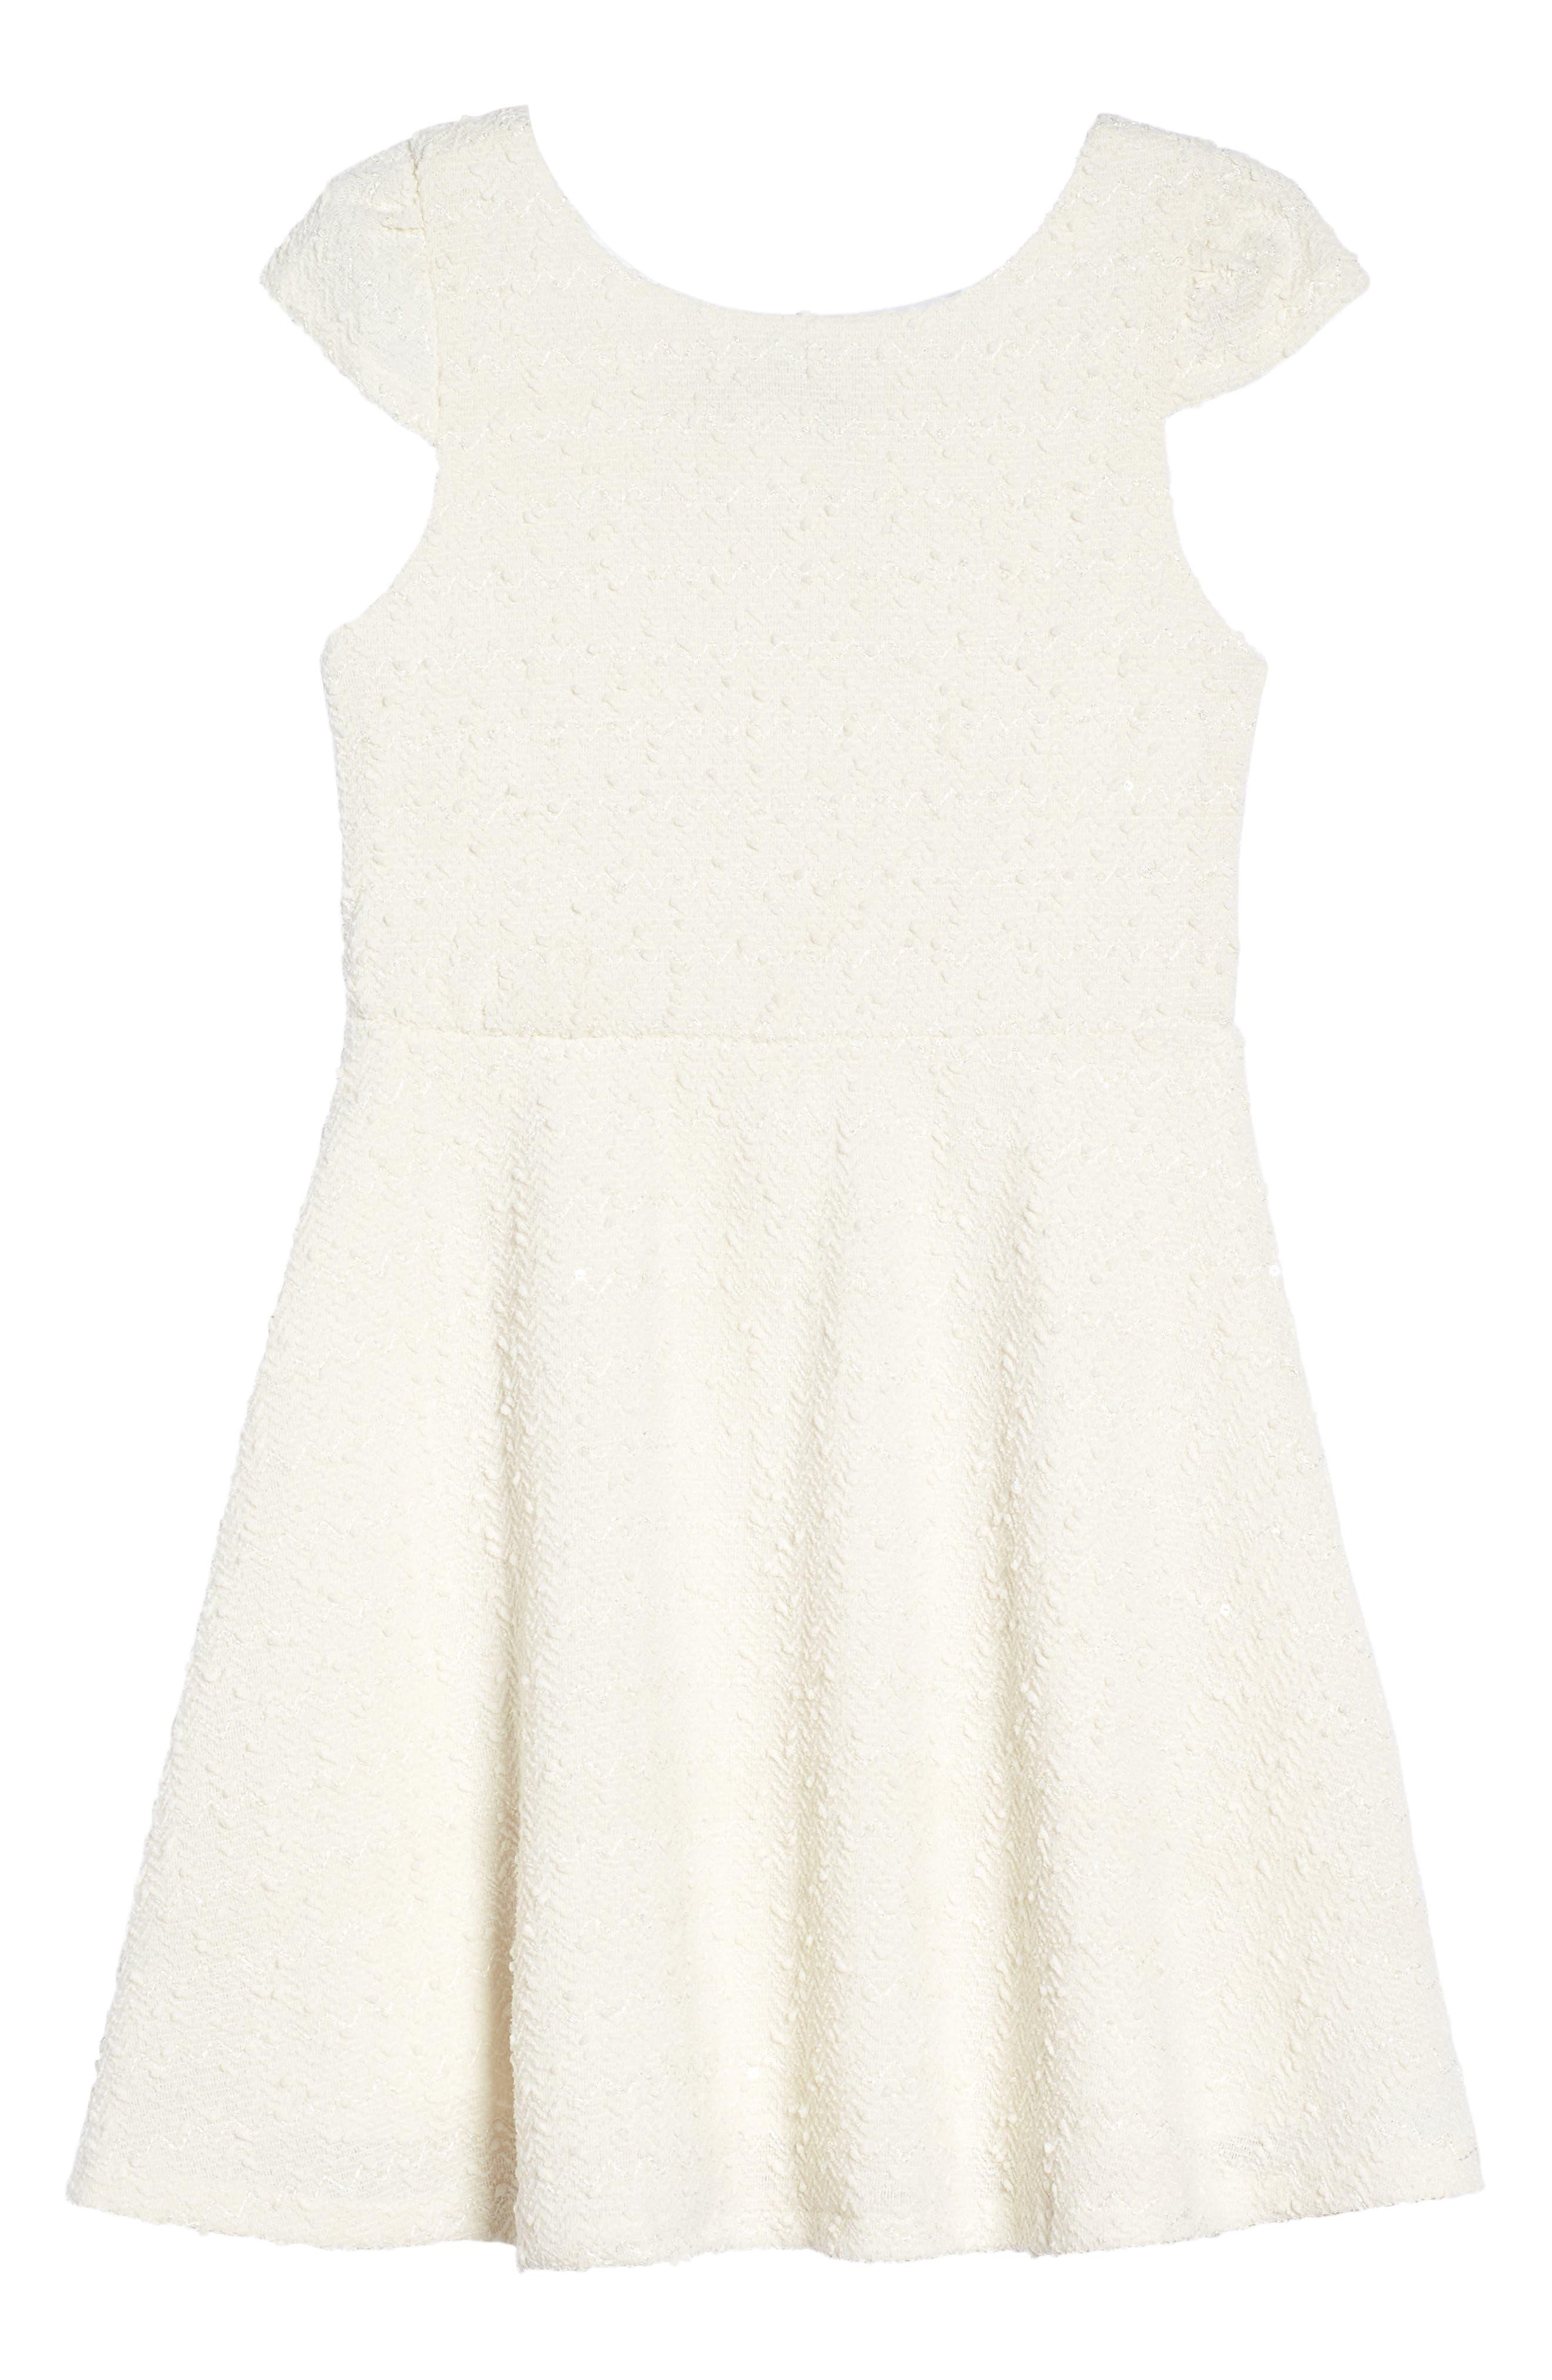 Carly Cap Sleeve Dress,                         Main,                         color, 250